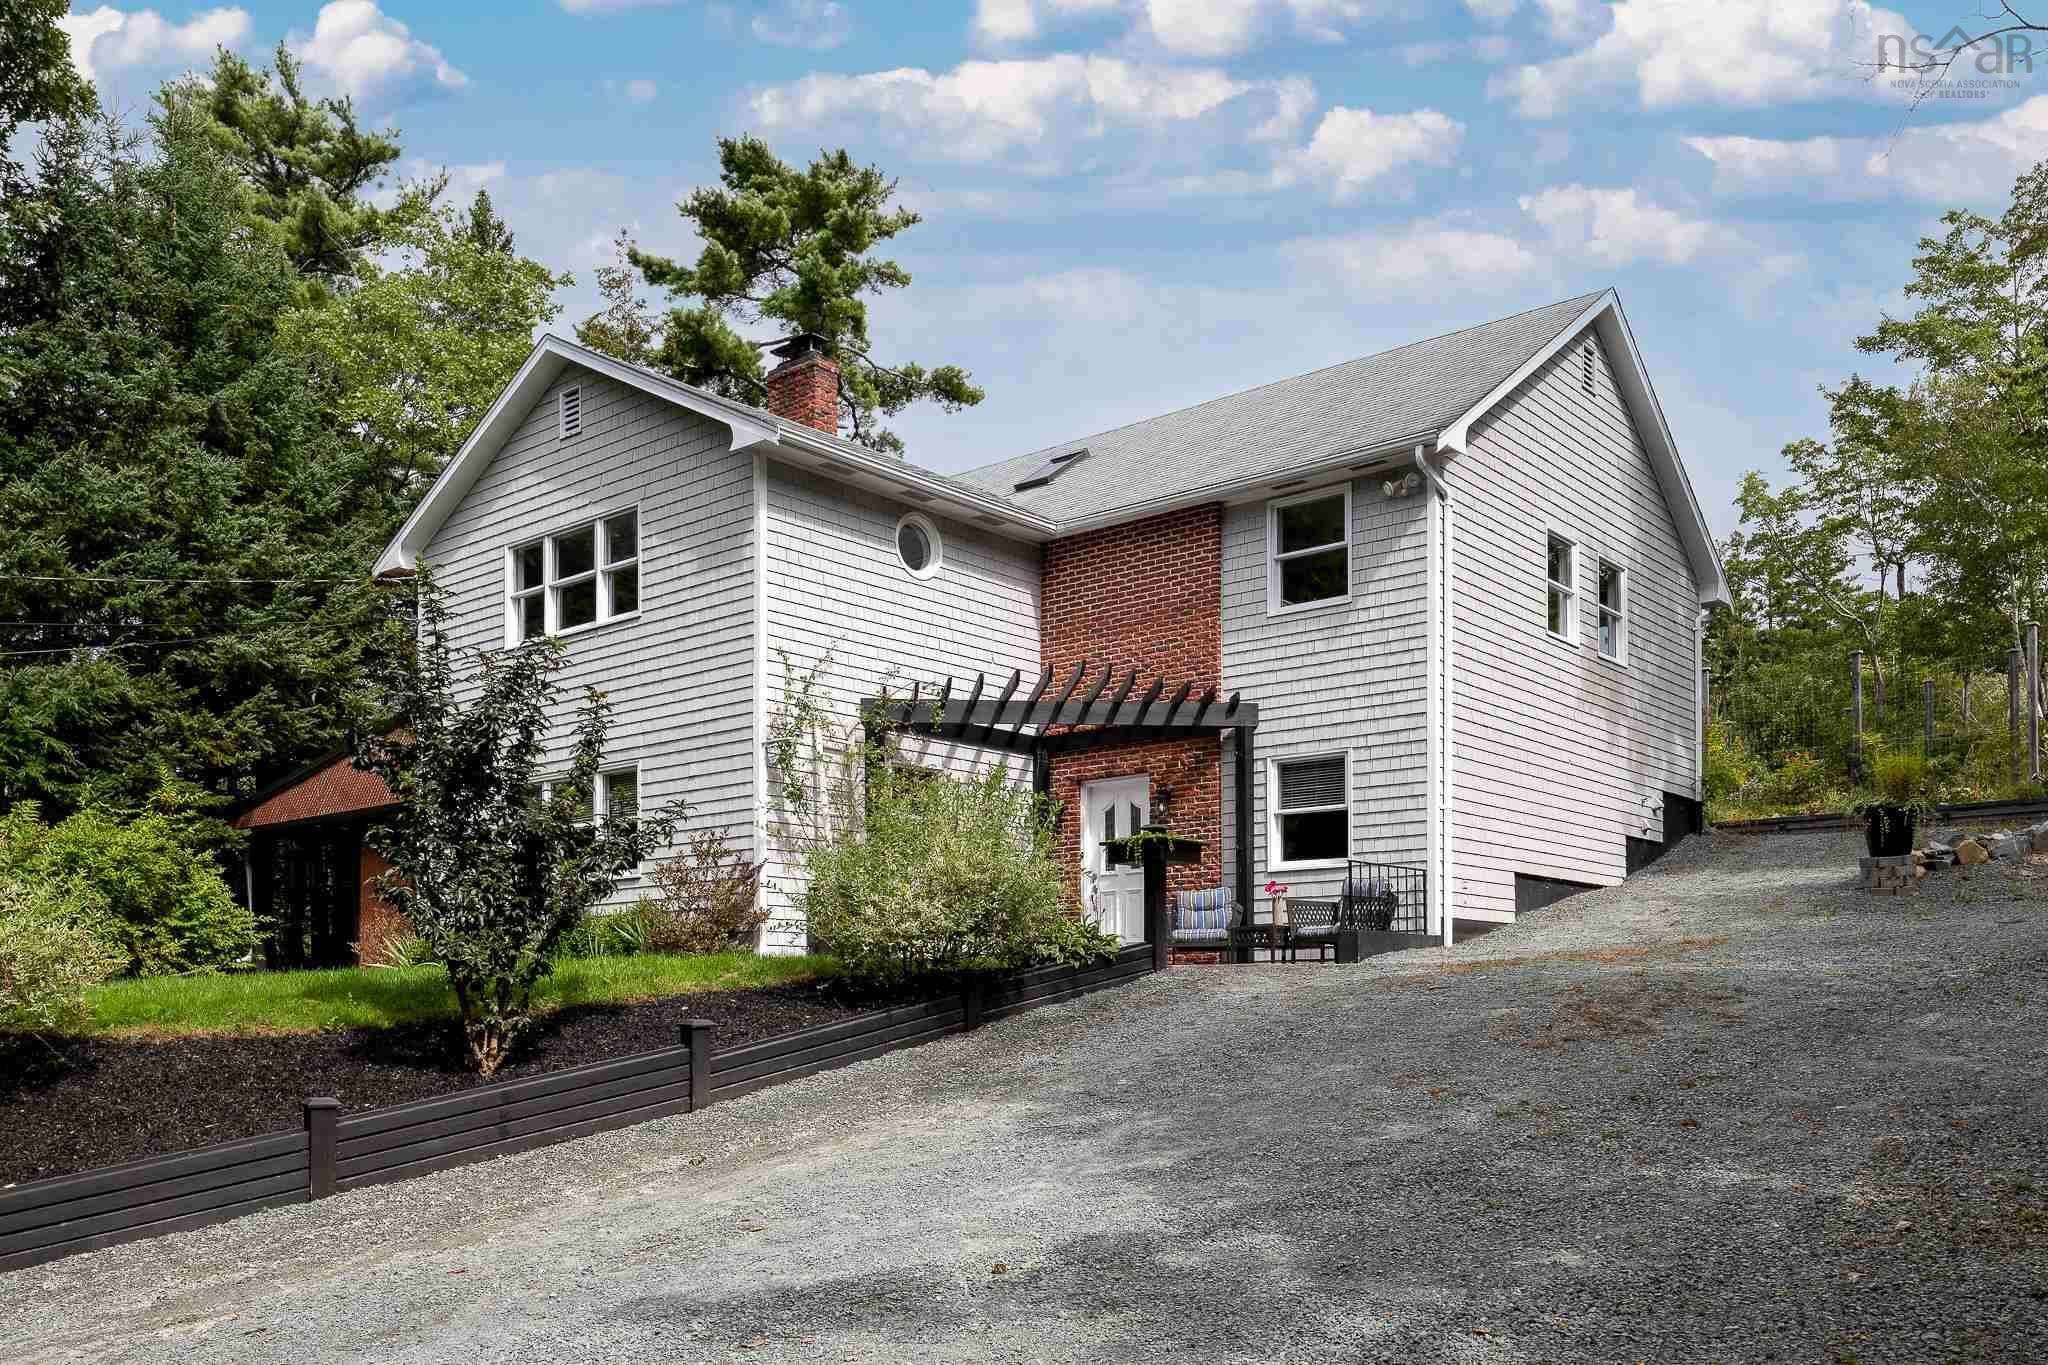 Main Photo: 1268 Waverley Road in Waverley: 30-Waverley, Fall River, Oakfield Residential for sale (Halifax-Dartmouth)  : MLS®# 202124199